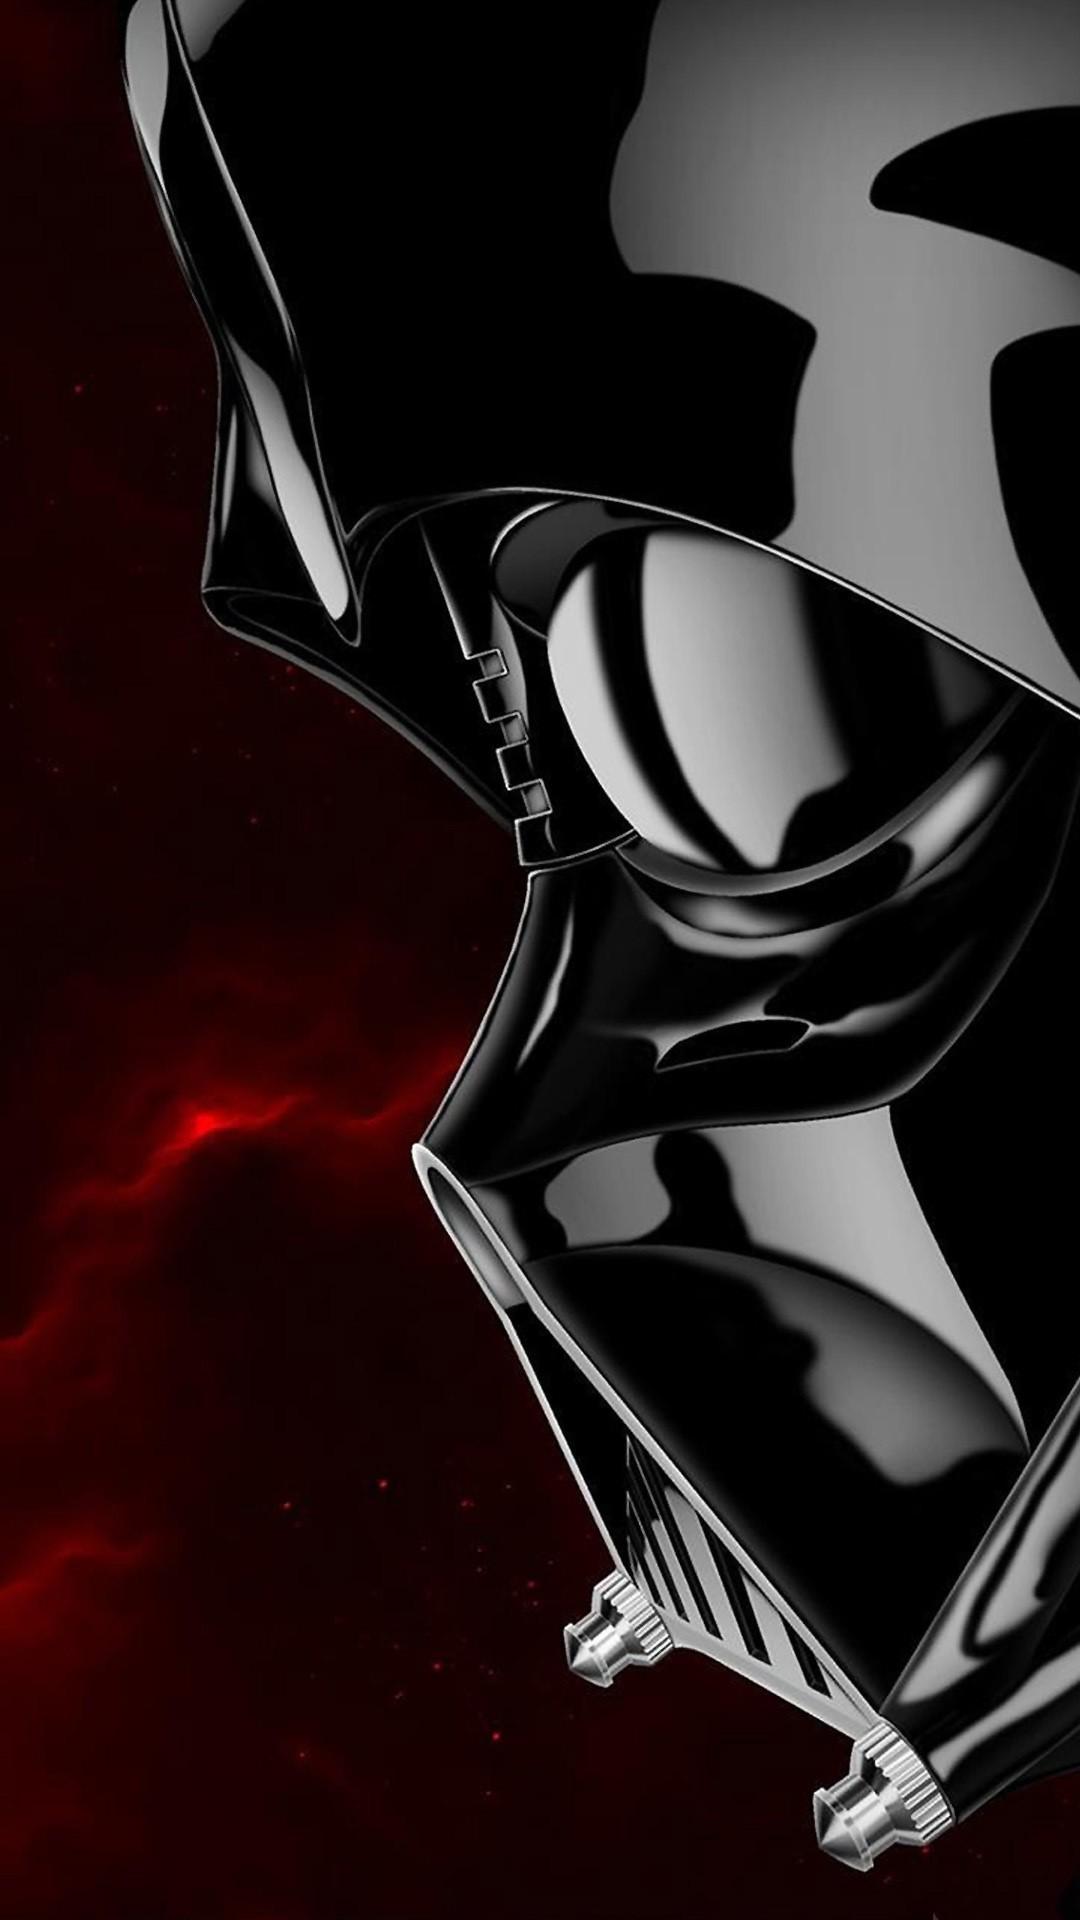 Darth Vader Star Wars Illustration Android Wallpaper free download